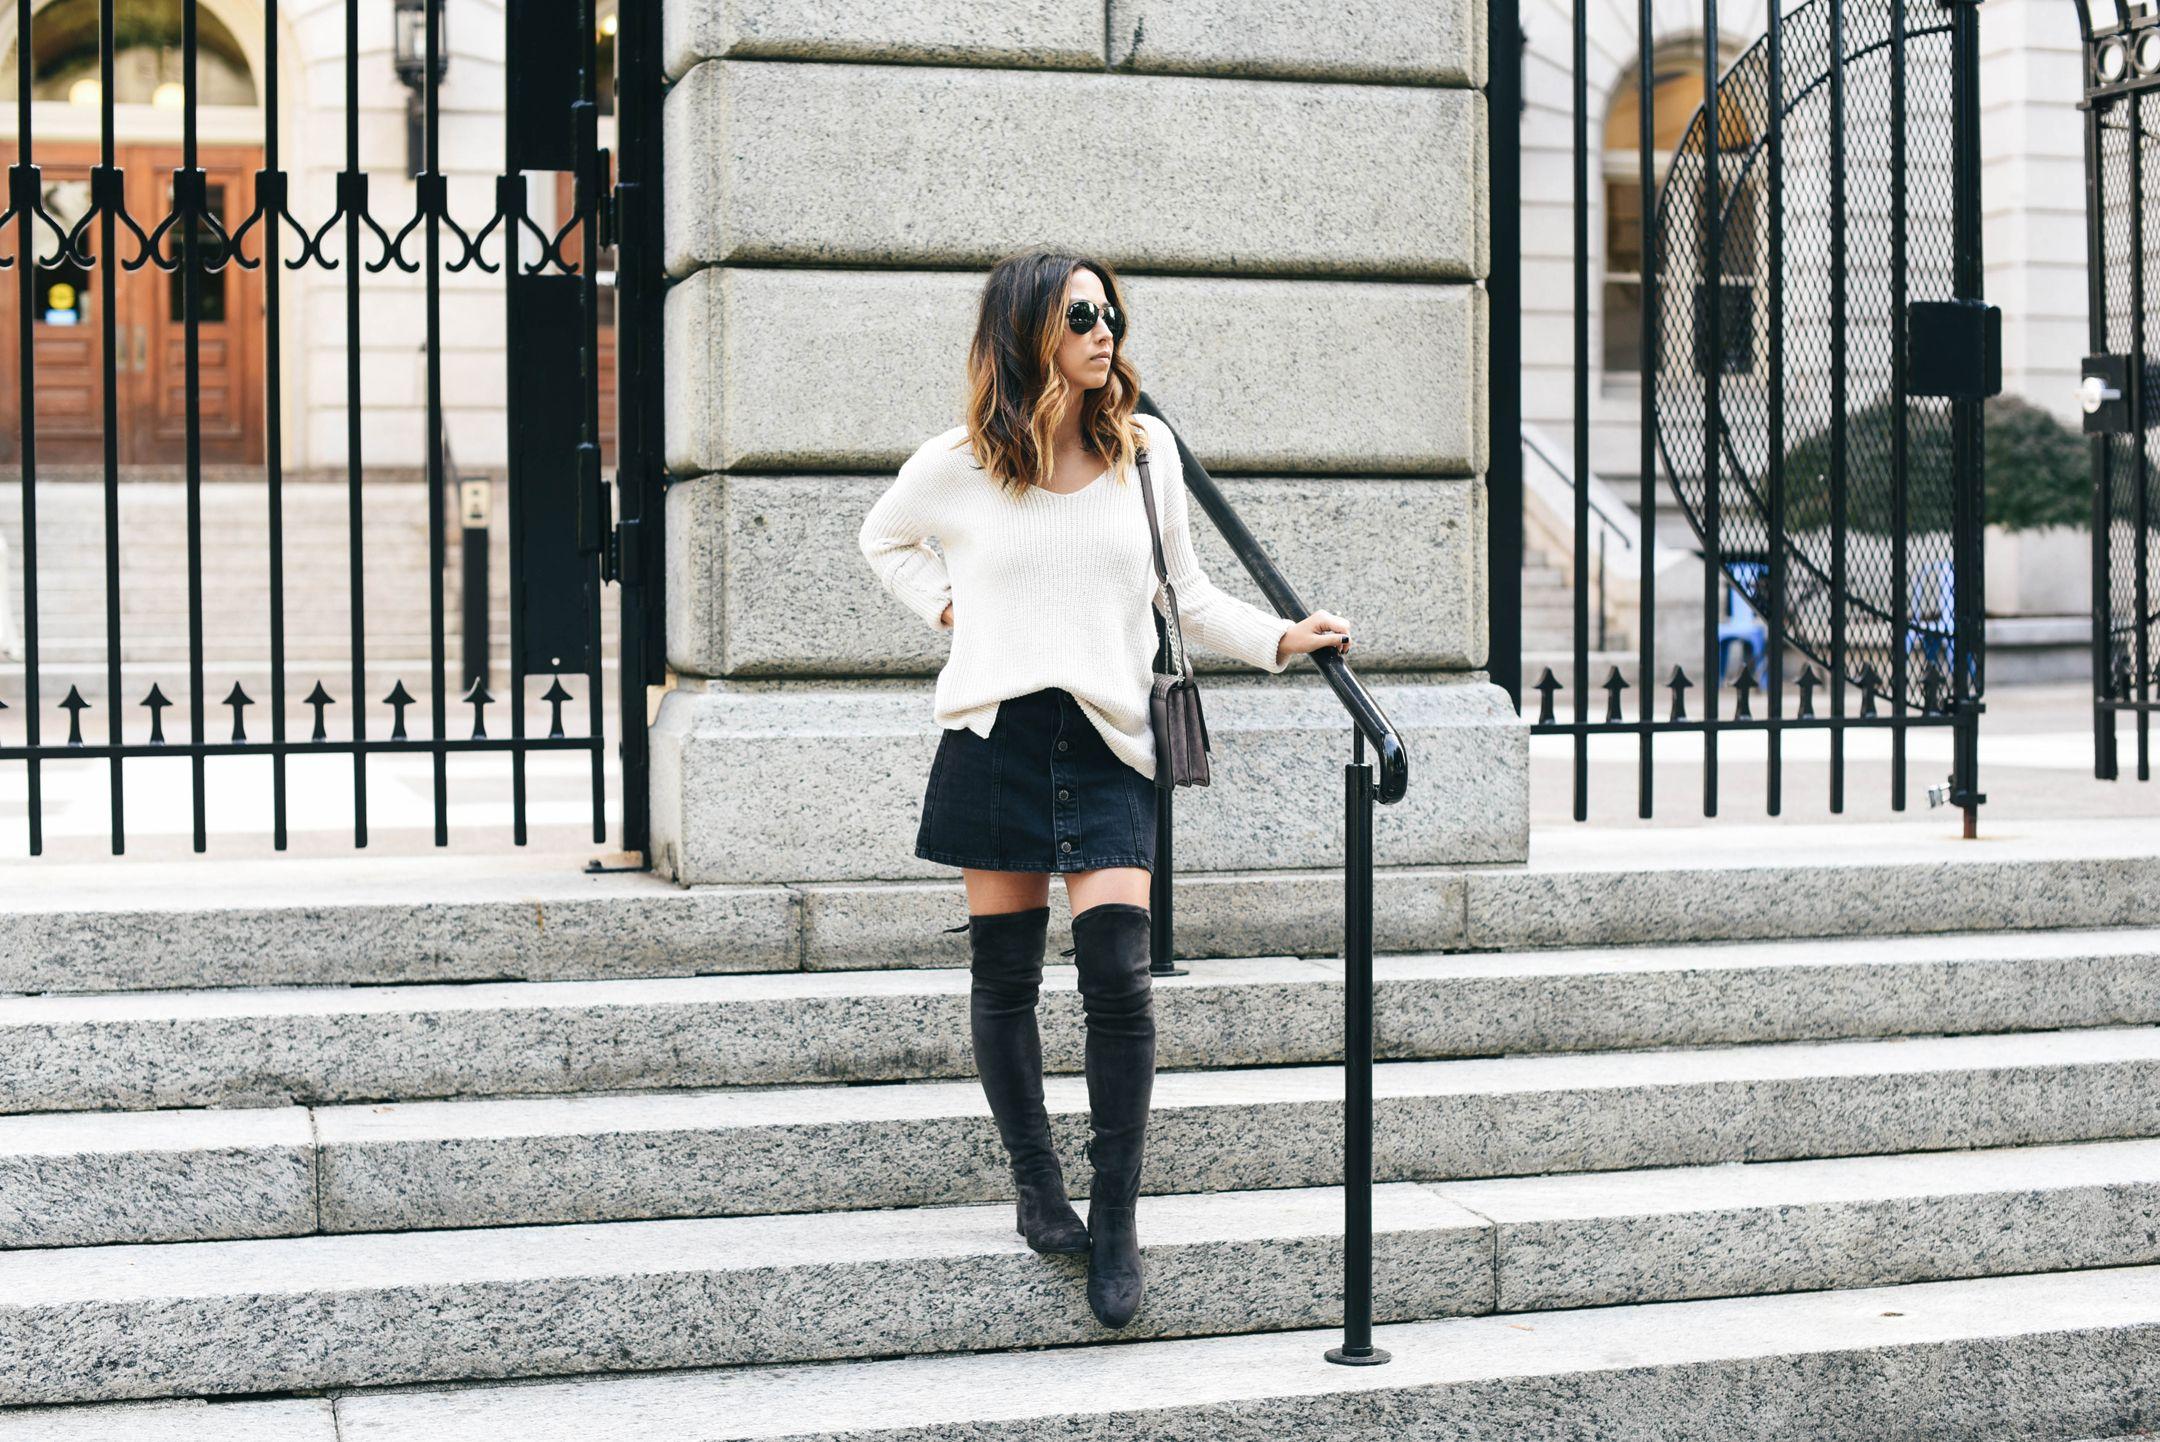 4a106b7b080 Dolce Vita Neely boots + denim skirt + button back sweater cream + grey  taupe bag